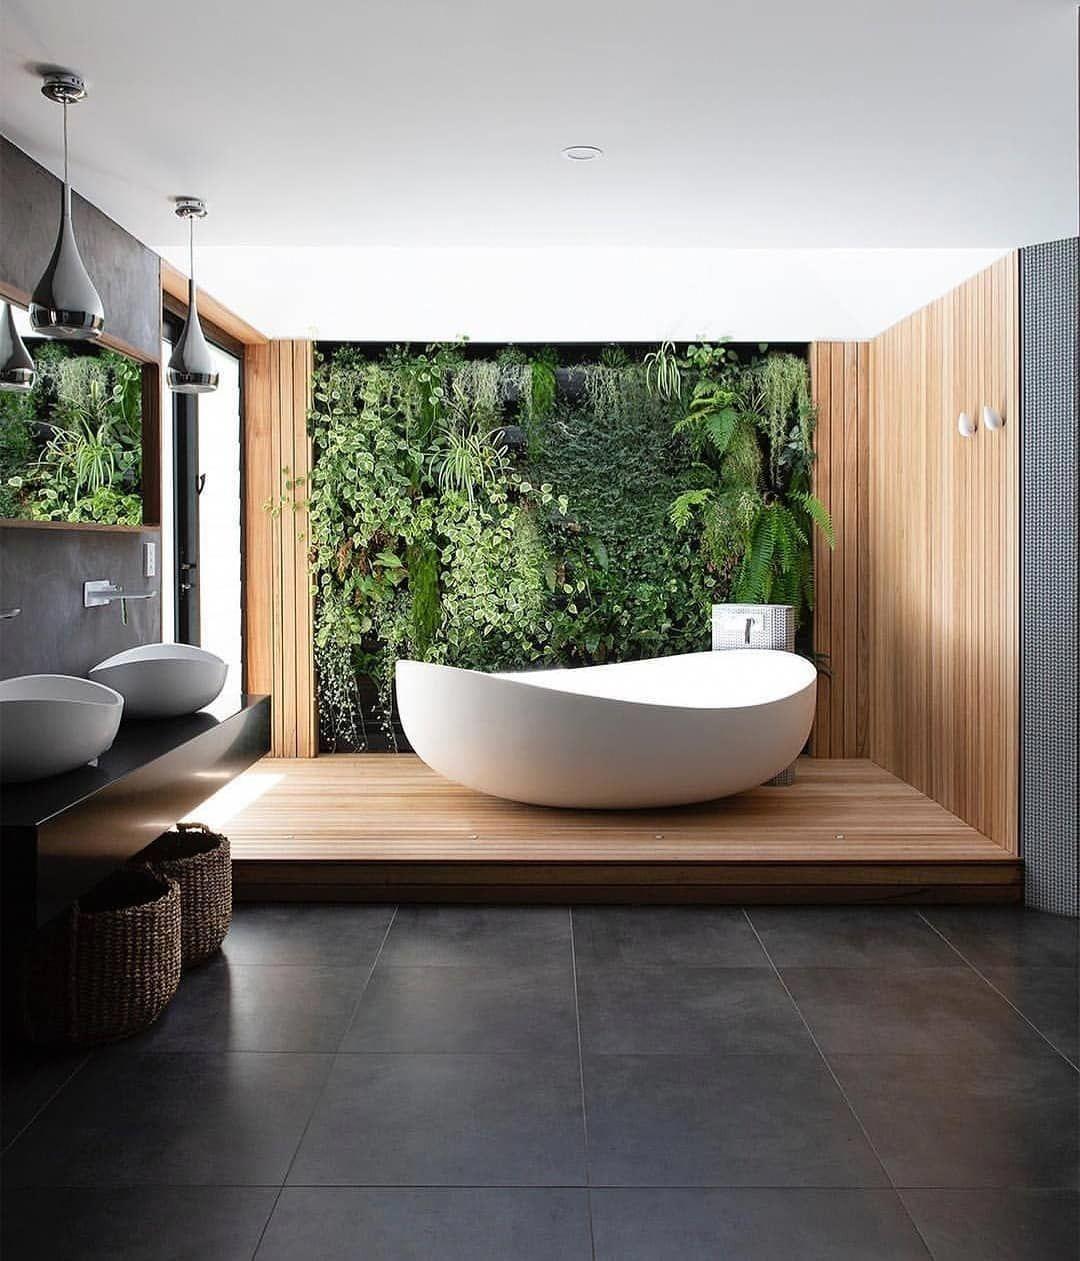 Bathroom Mirror Tips For Choosing The Ideal Model Master Bathroom Decor Modern Bathroom Design Bathroom Interior Design